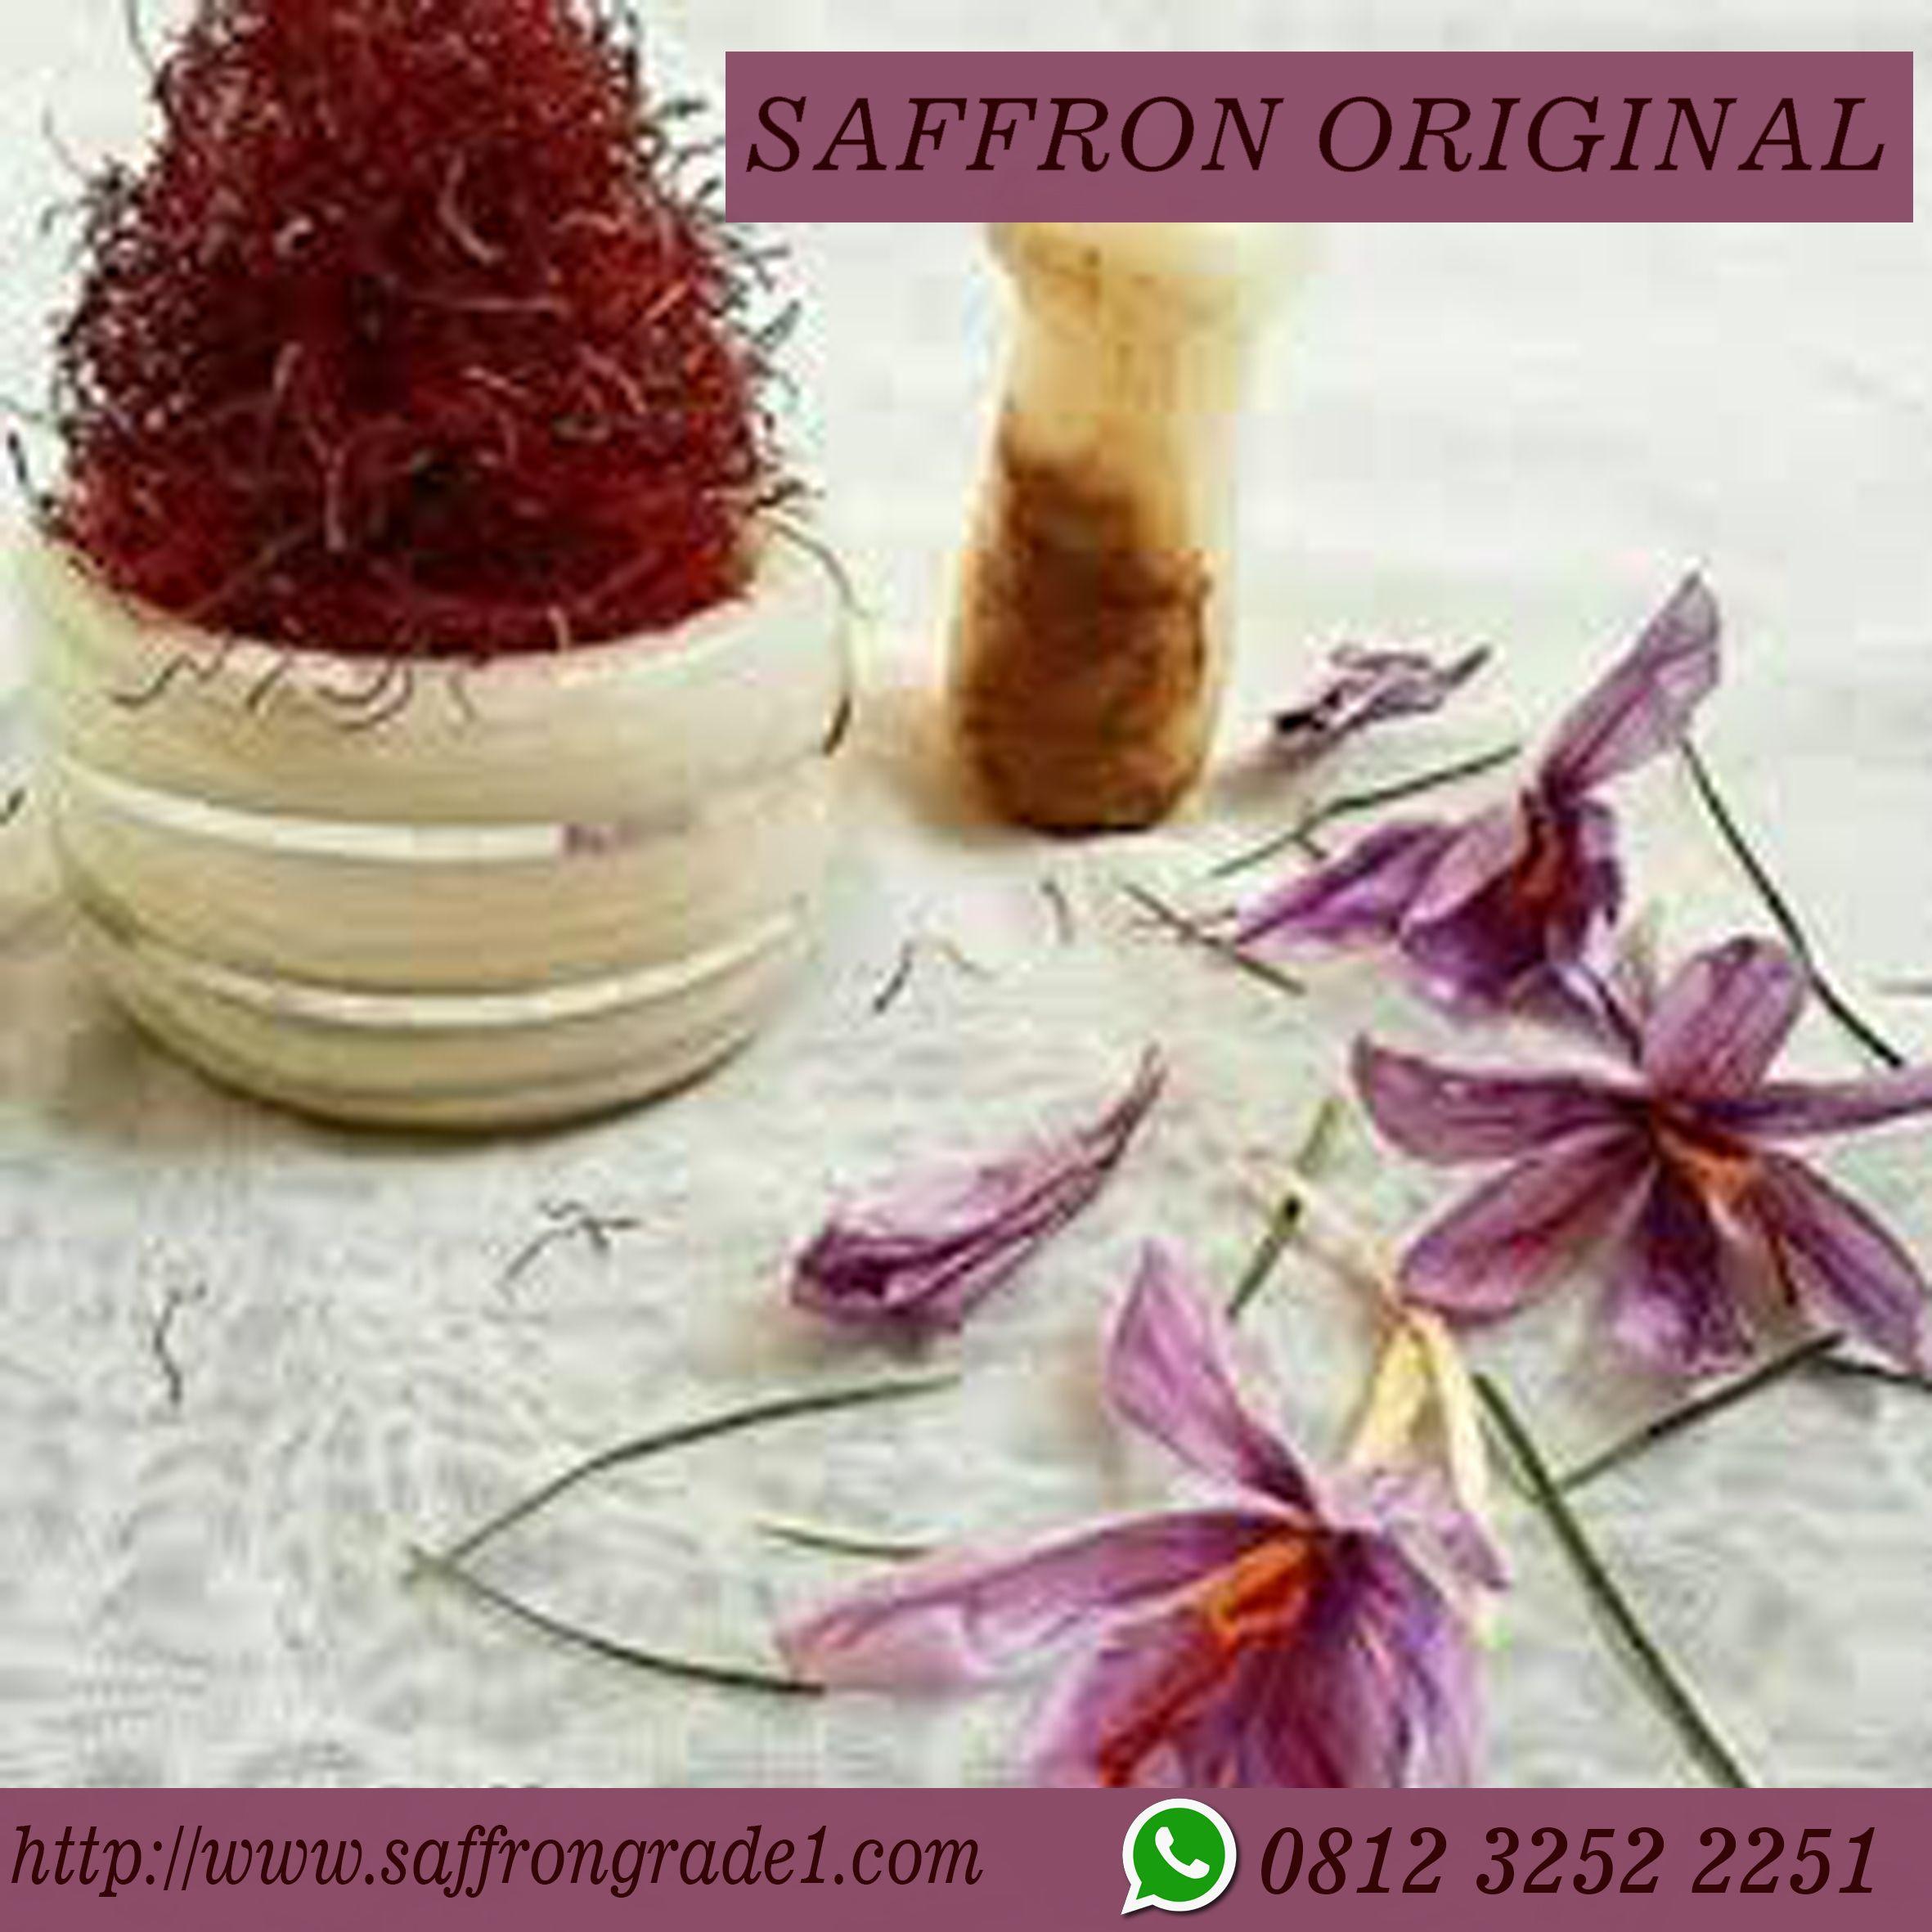 Negin Wa 62 812 3252 2251 Tsel Jual Bunga Saffron Minuman Bogor Yogyakarta Penjual Bunga Bunga Yogyakarta